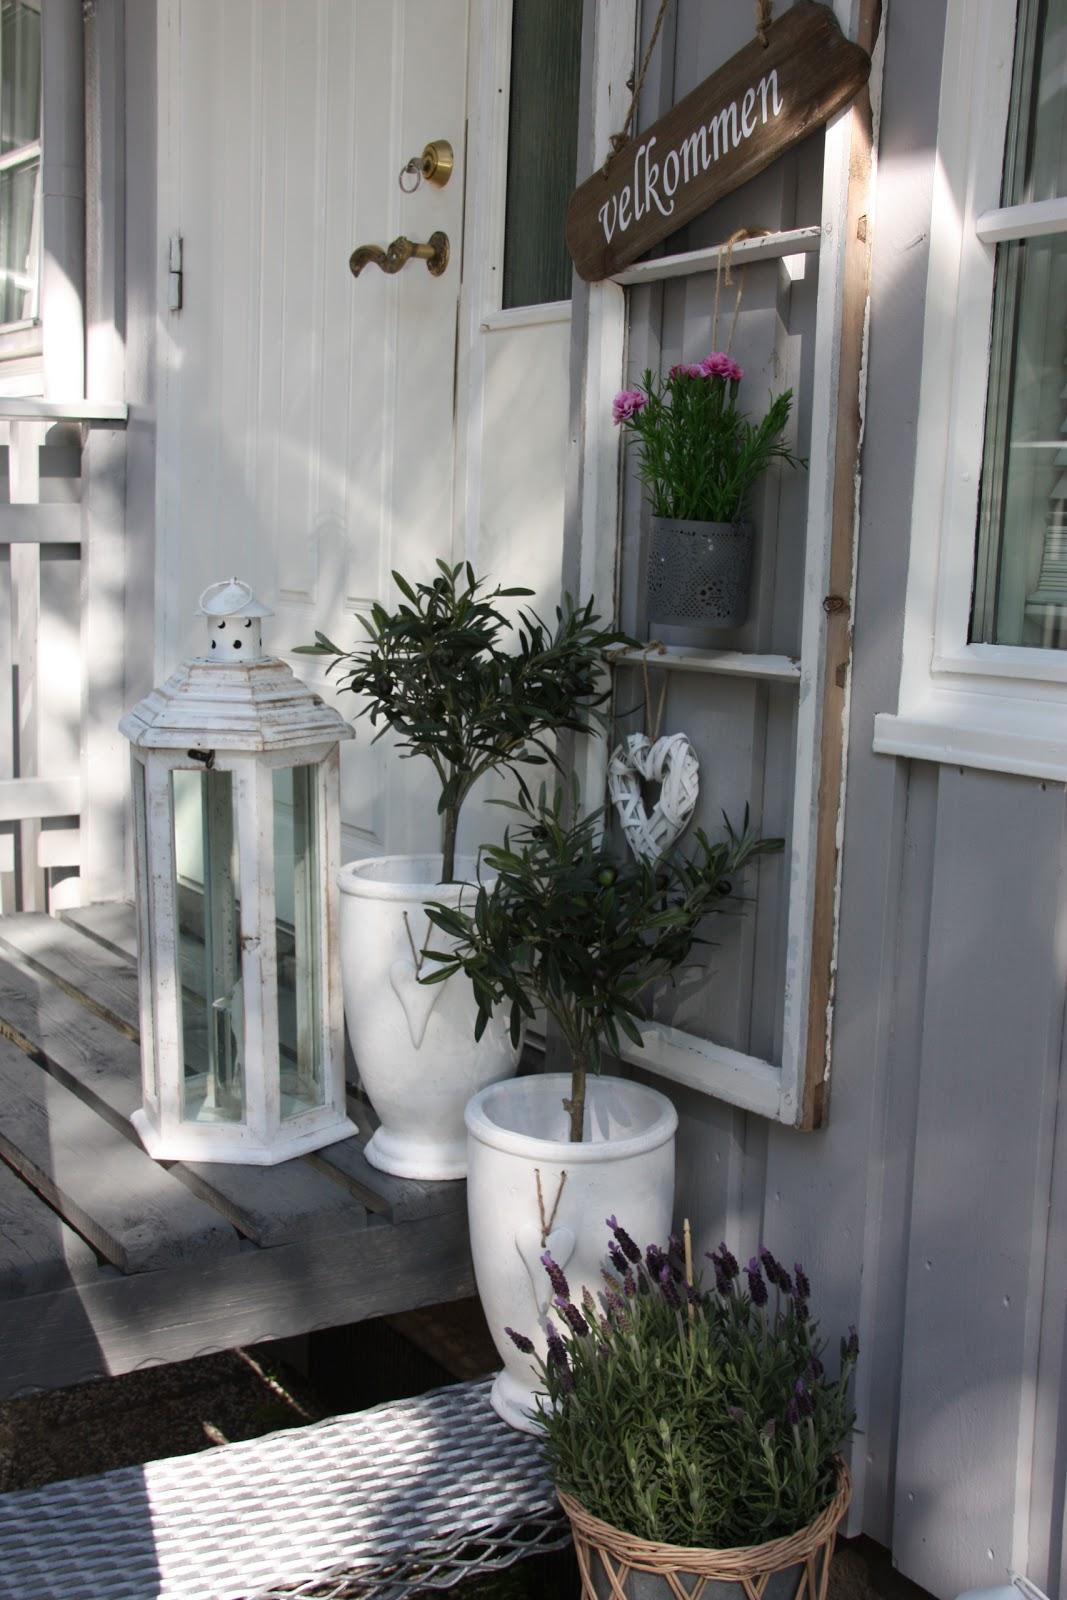 Daisys home pynta opp inngangspartiet - Ideen hauseingang ...